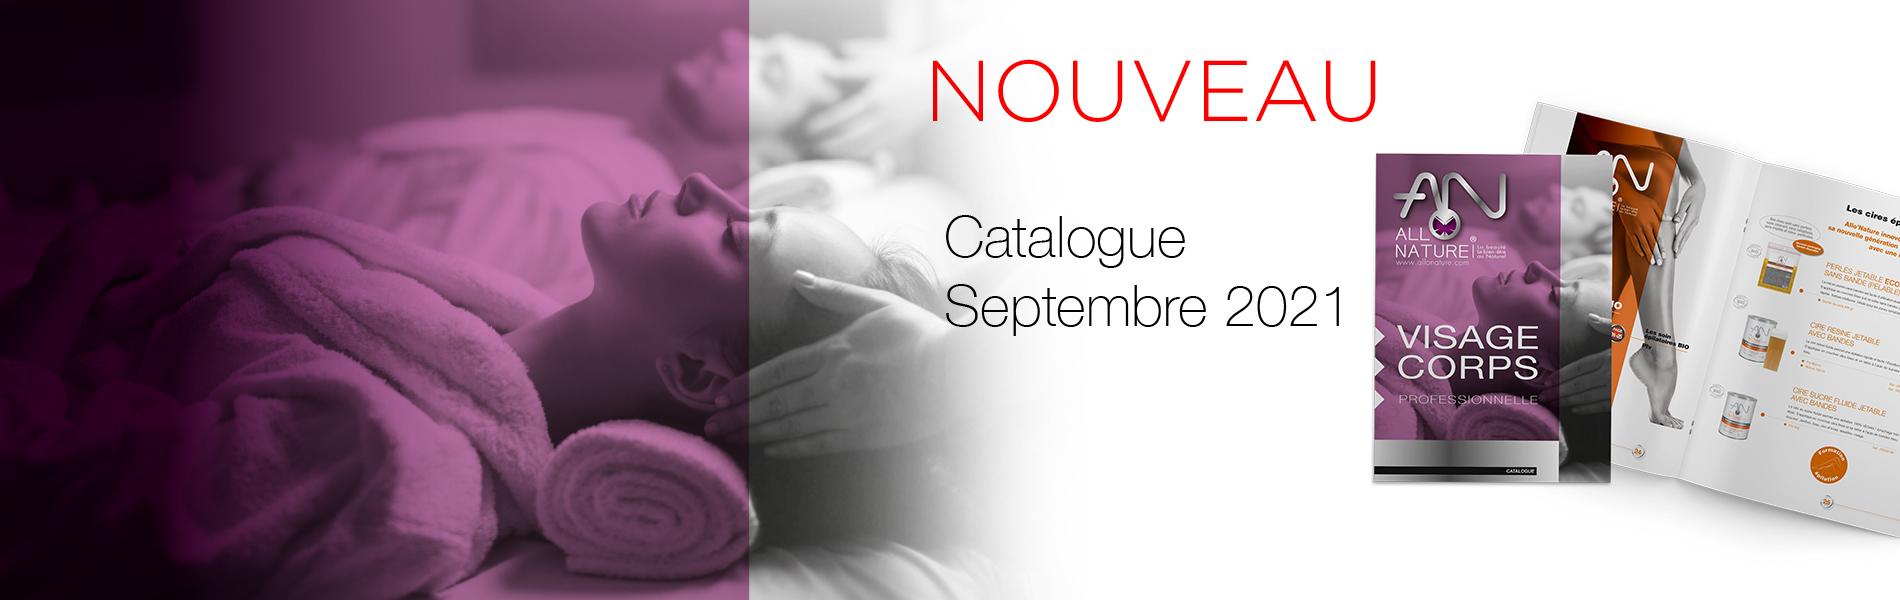 slide-catalogue.jpg